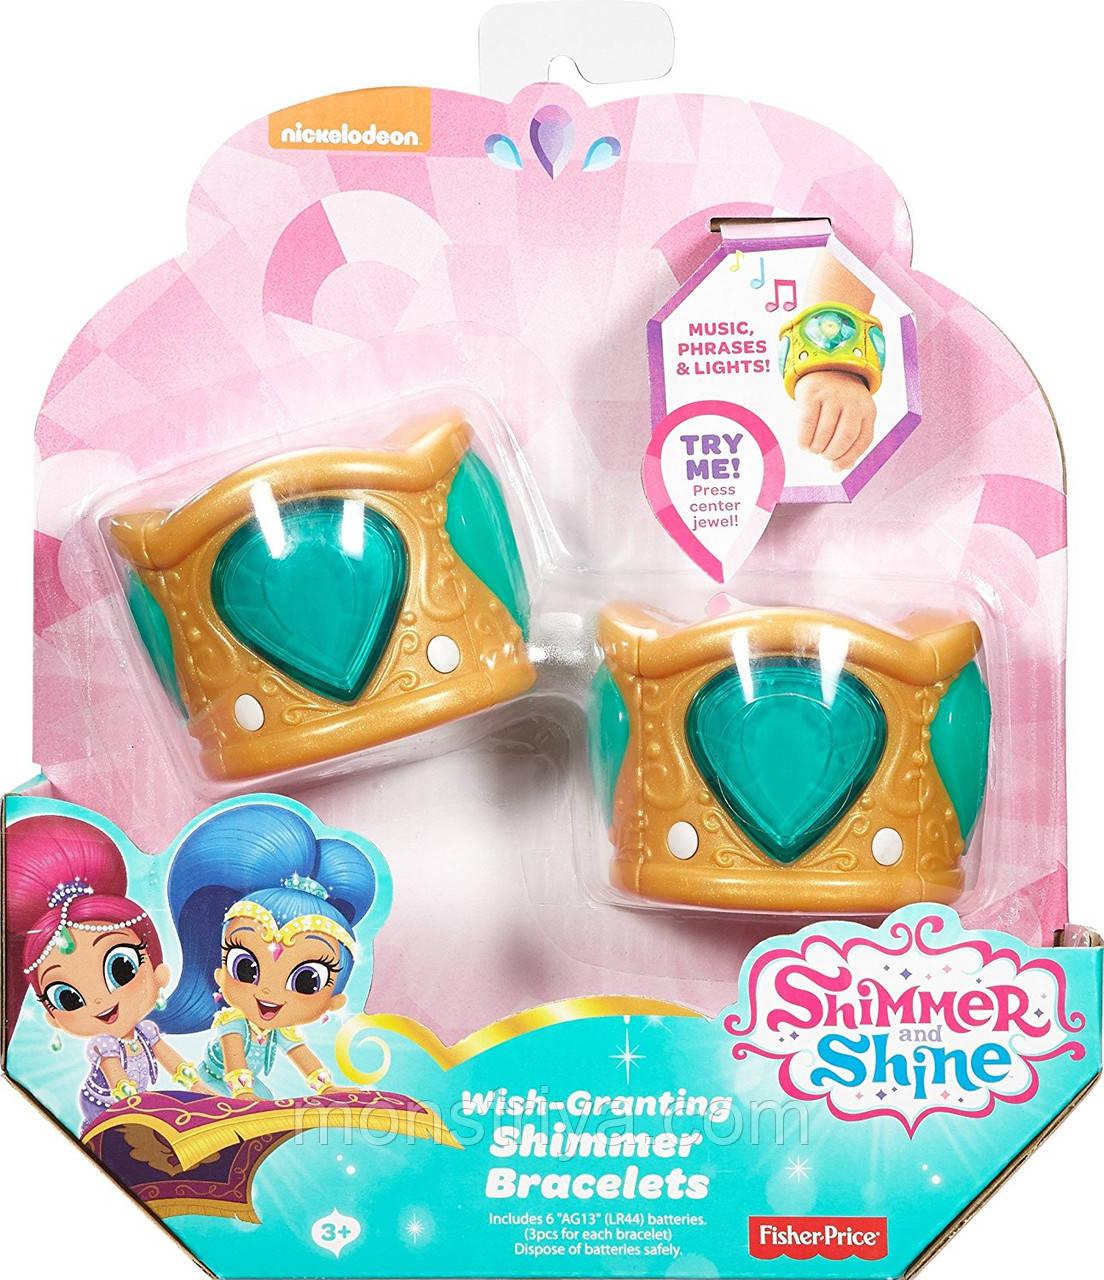 Музыкальные браслеты -Шиммер -Шиммер и Шайн - Мерцание и Блеск/ Shimmer and Shine Fisher-Price